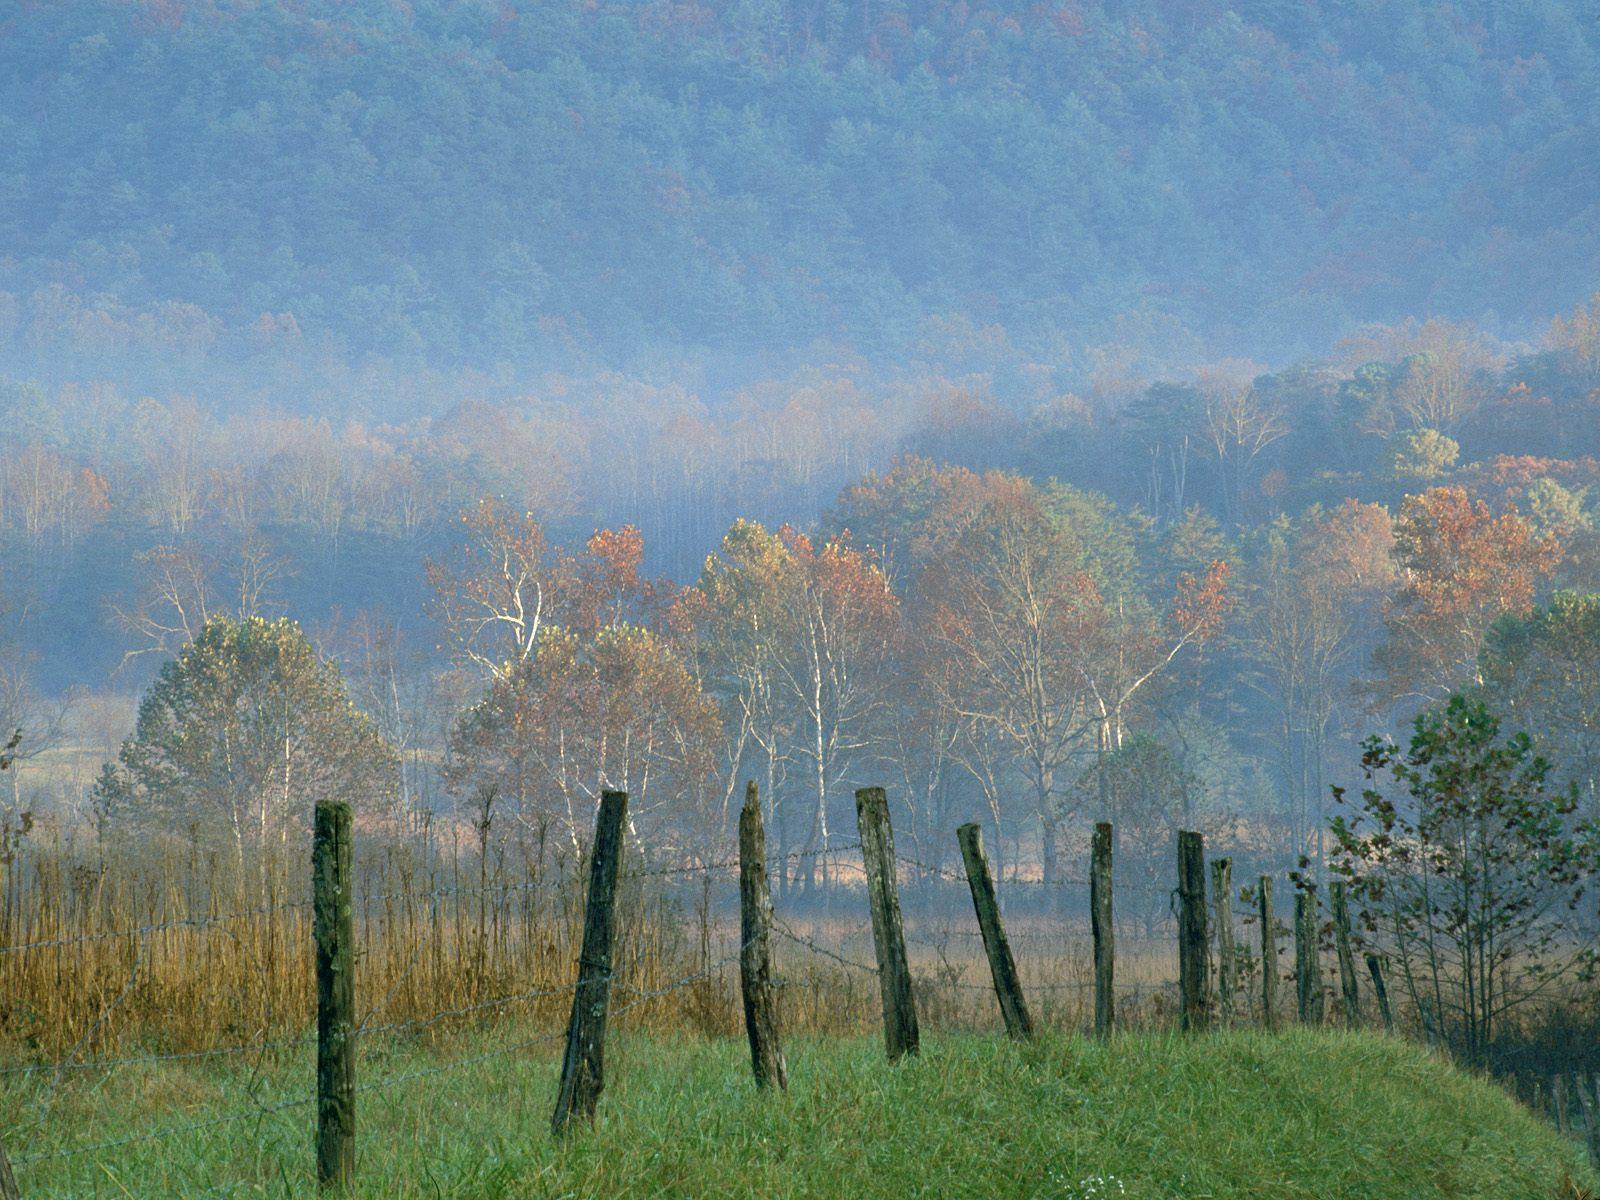 Fall Coastal Desktop Wallpaper Cades Cove Great Smoky Mountains National Park Nature